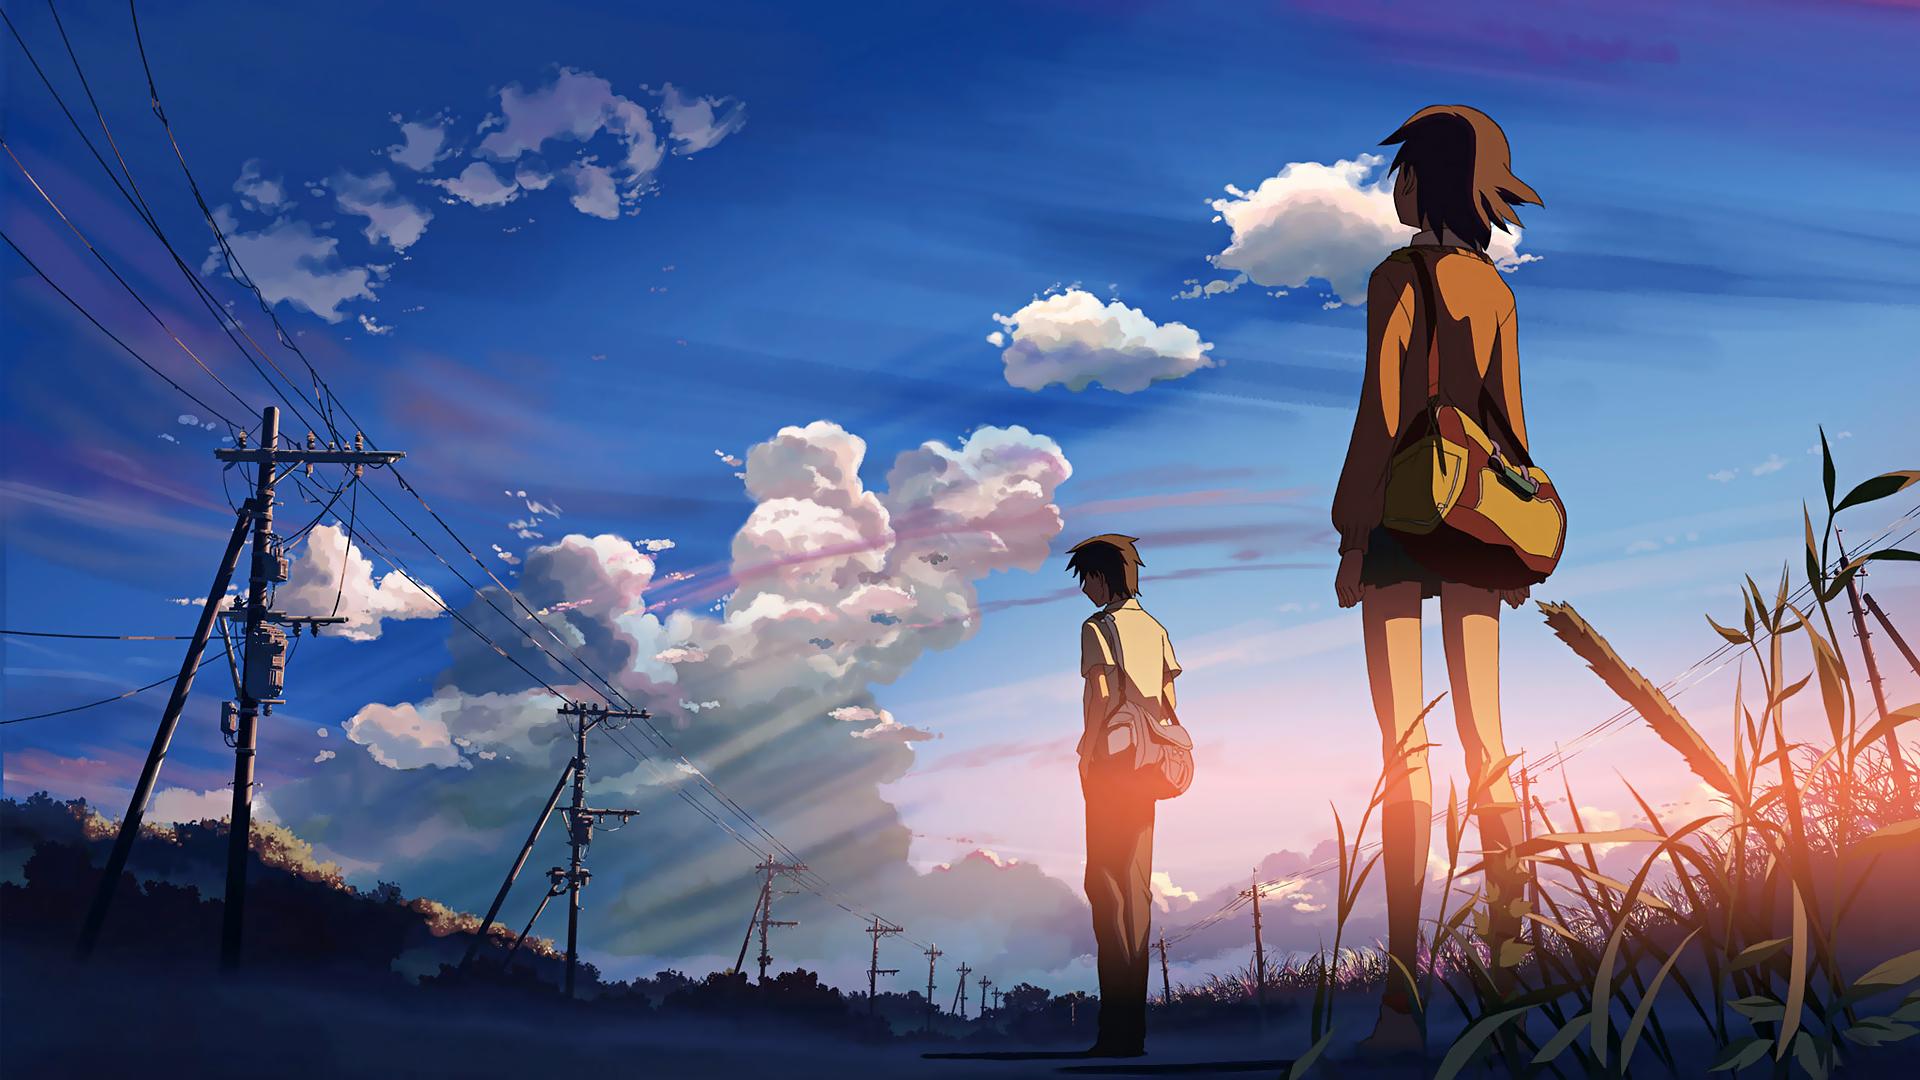 Anime Wallpapers Enhanced 1920x1080 Hq Update 2 Anime Scenery Anime Scenery Wallpaper Anime Background